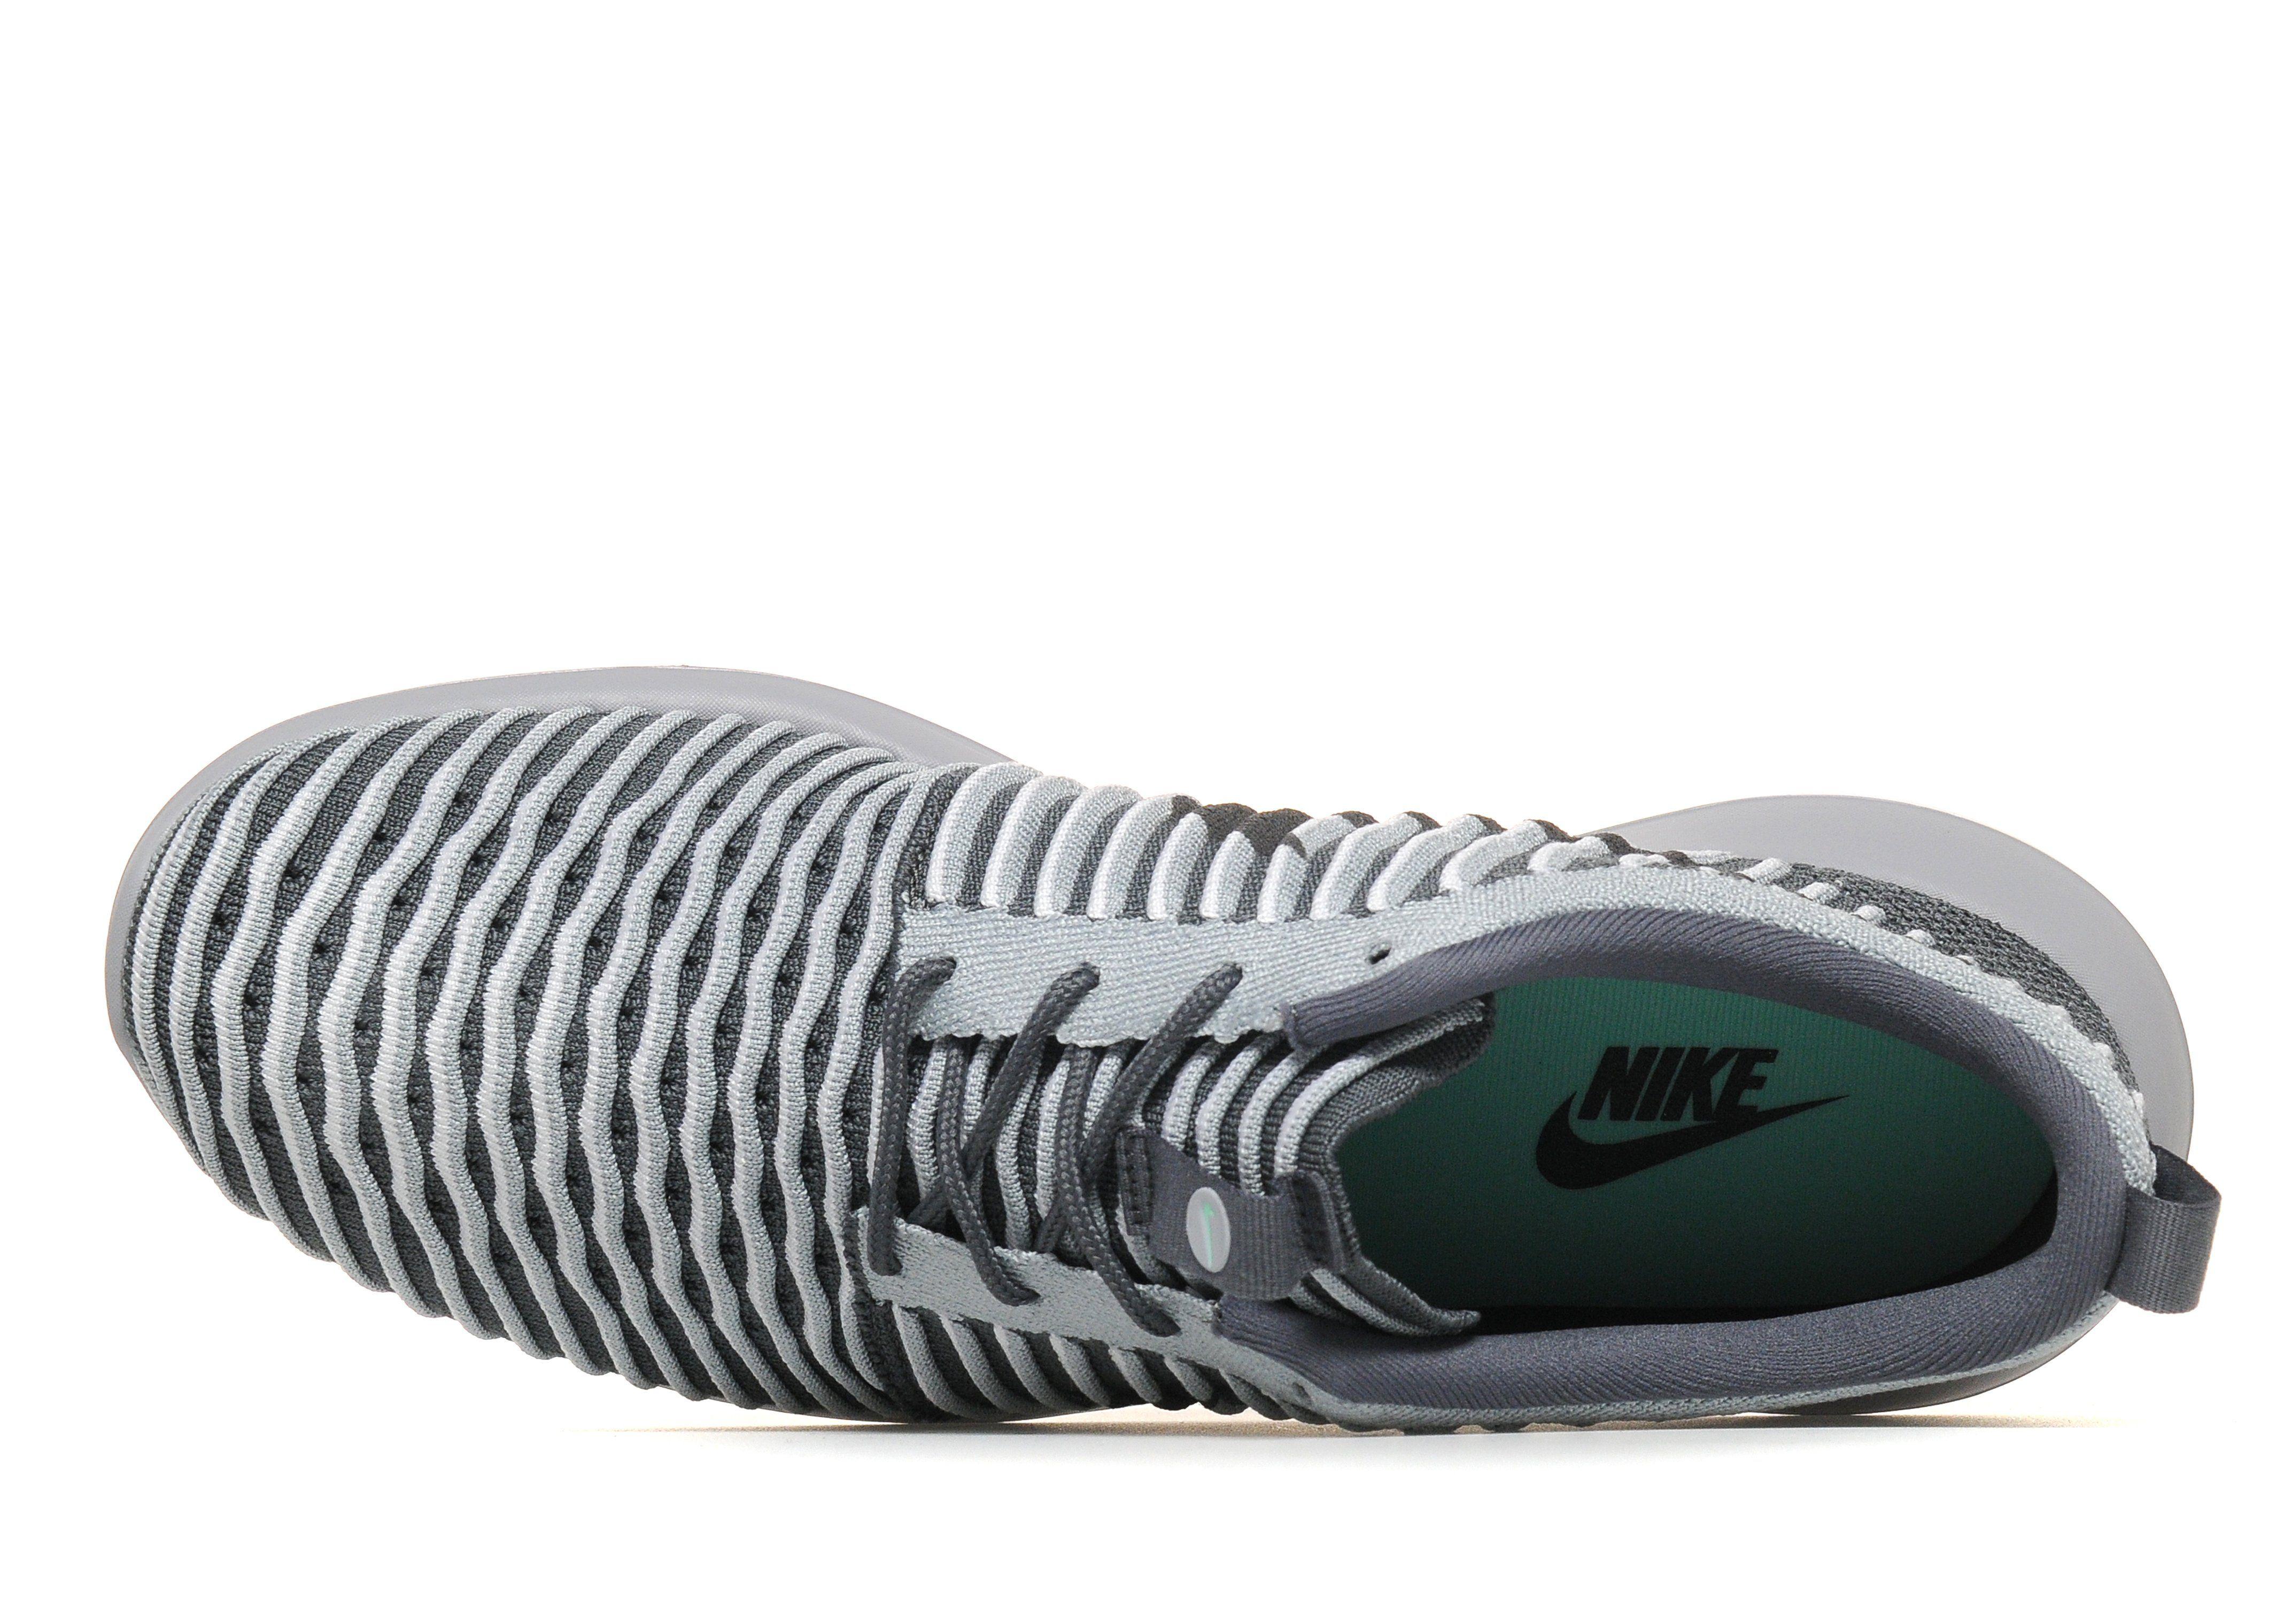 wcmoo Nike Roshe 2 Flyknit | JD Sports